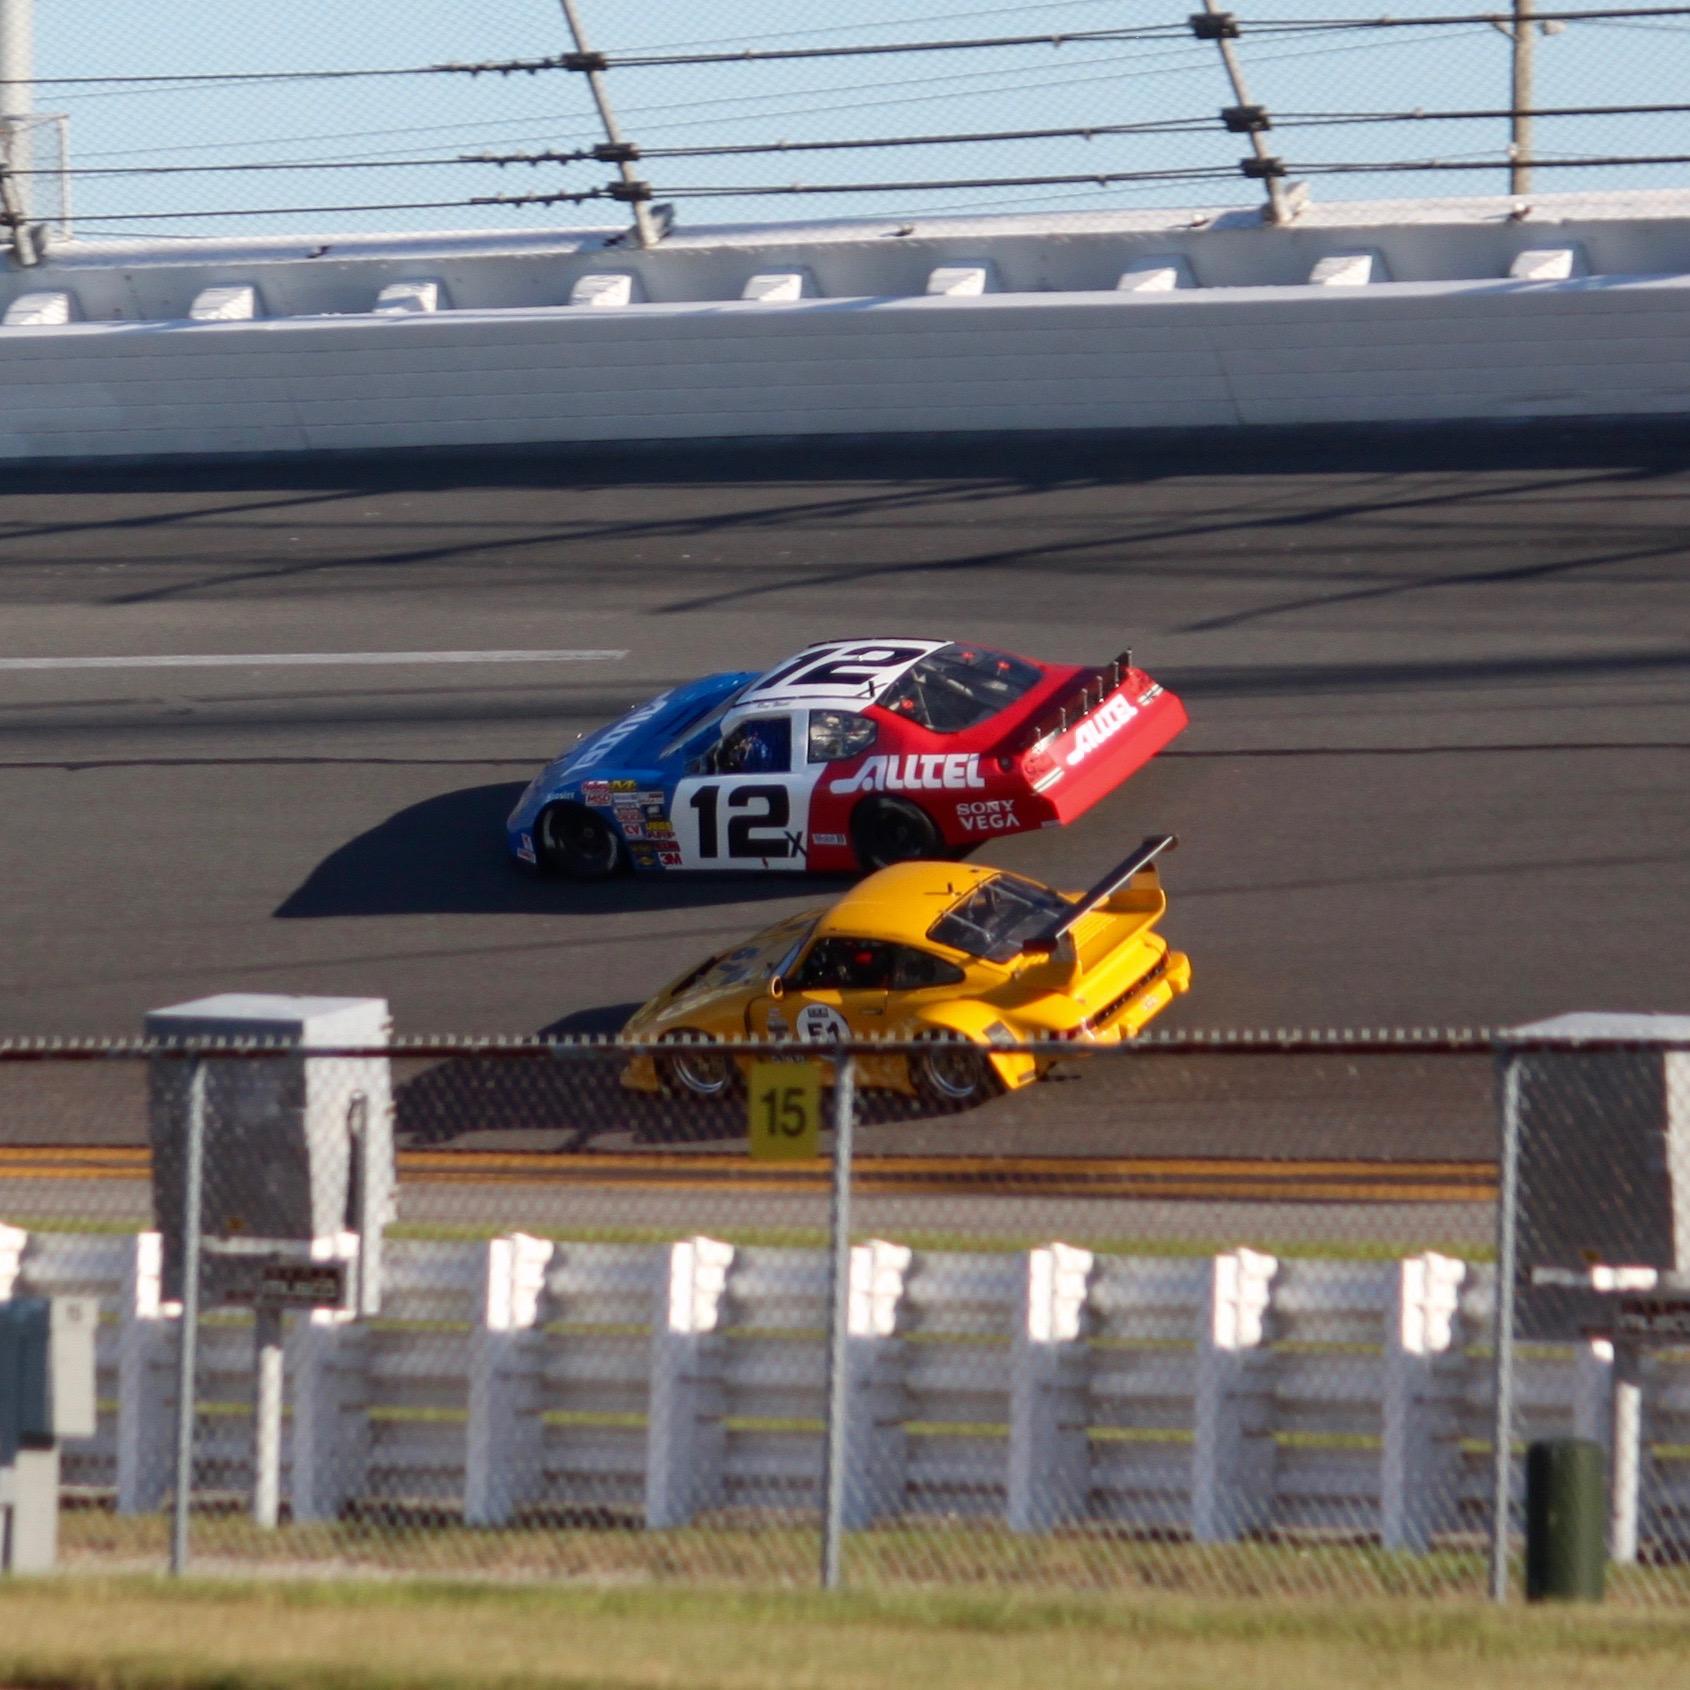 Daytona Speedway Tours Cost